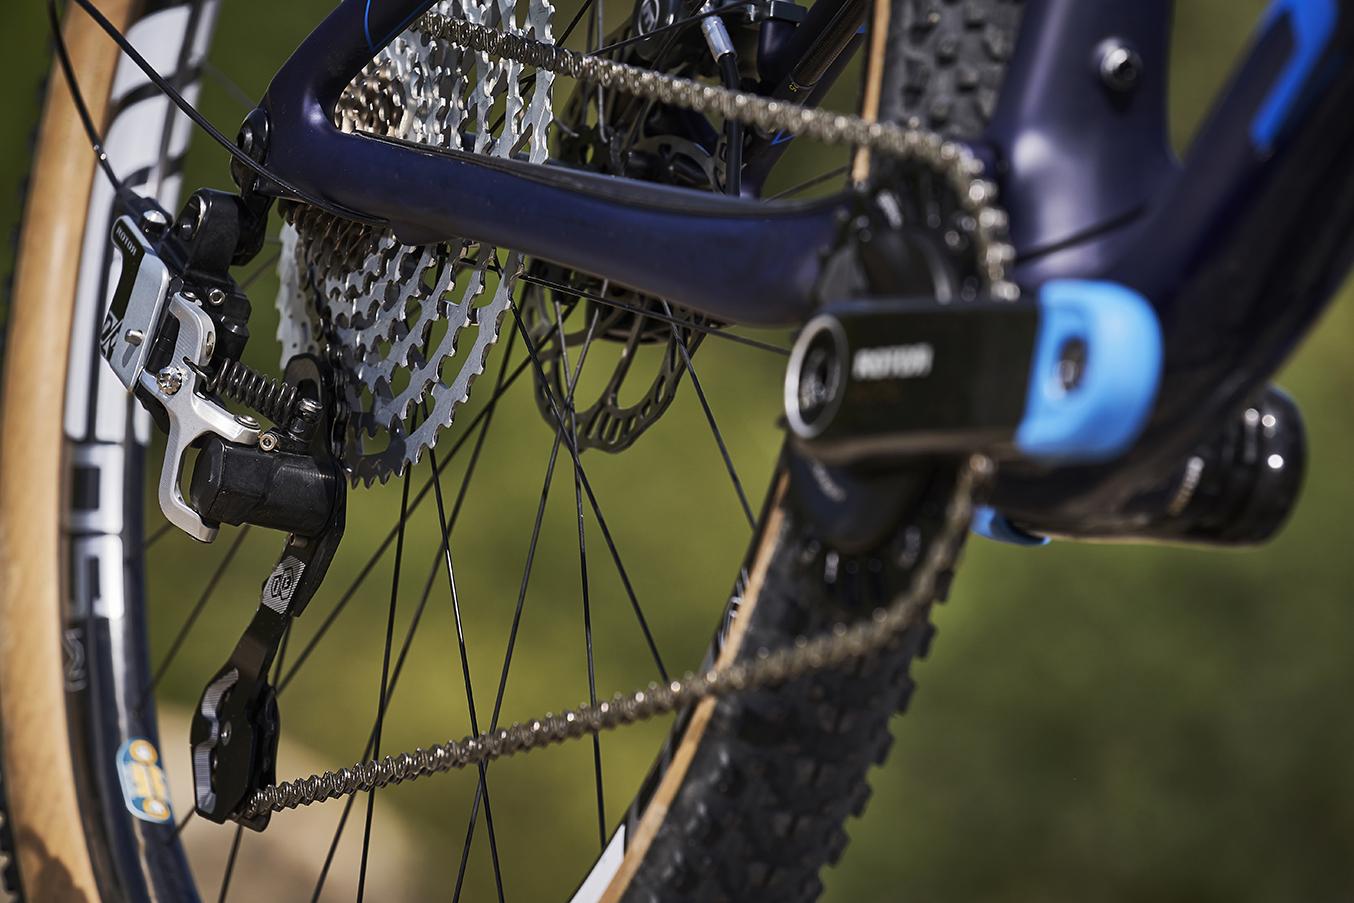 The ROTOR 13-speed Hydraulic MTB Drivetrain is Designed for Reliability, Available Soon - Singletracks Mountain Bike News